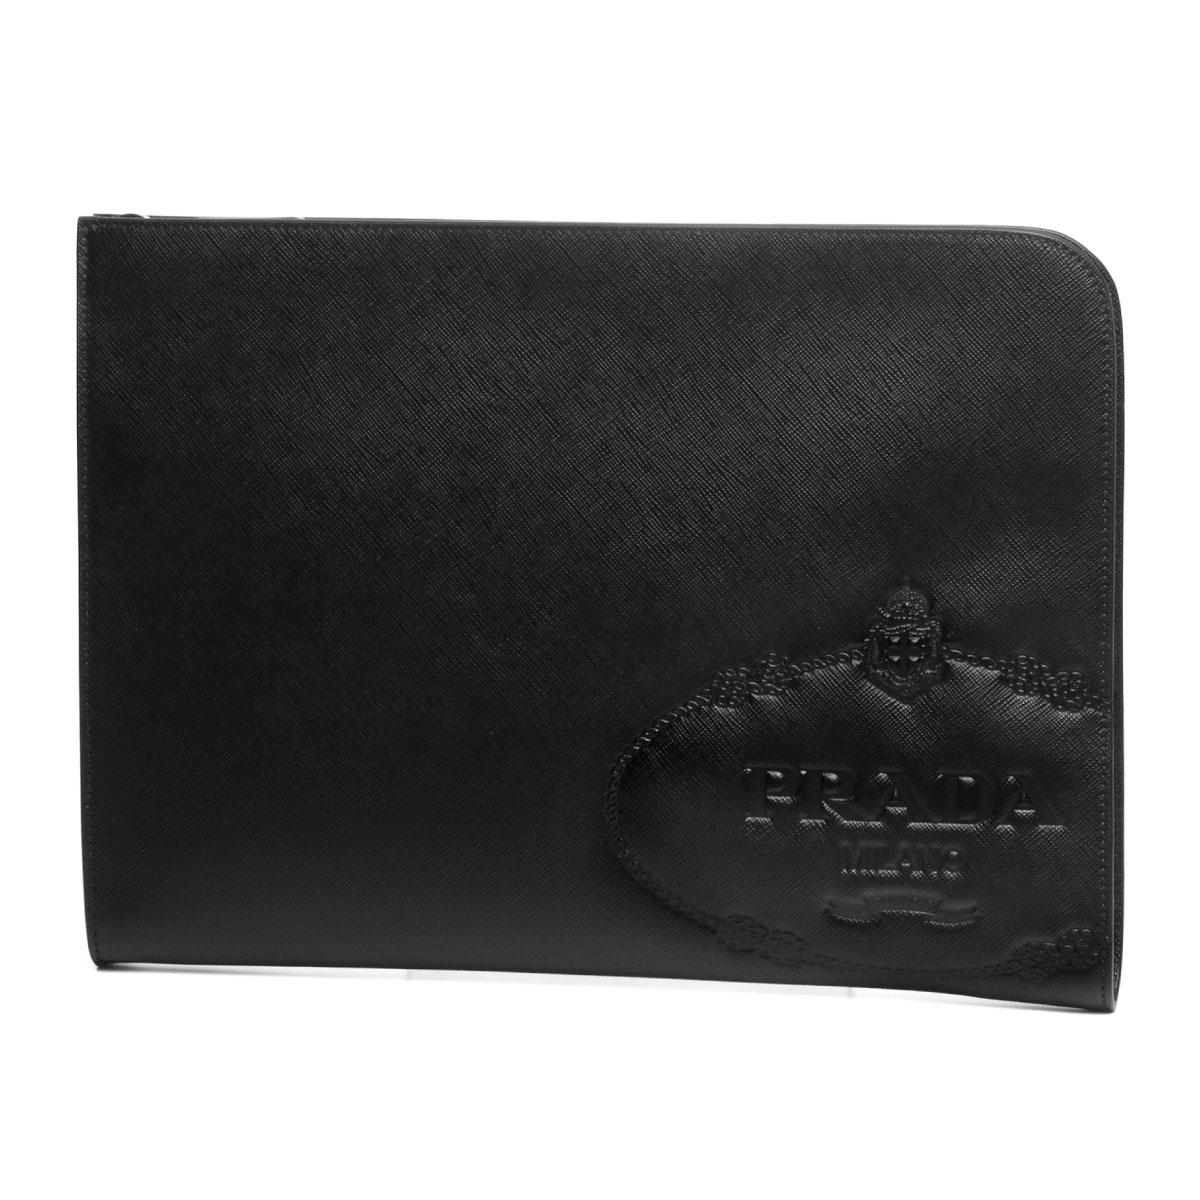 0e21dc6390f8 importshopdouble  Prada PRADA bag men 2VN003 OLO 9Z2 F0002 clutch ...